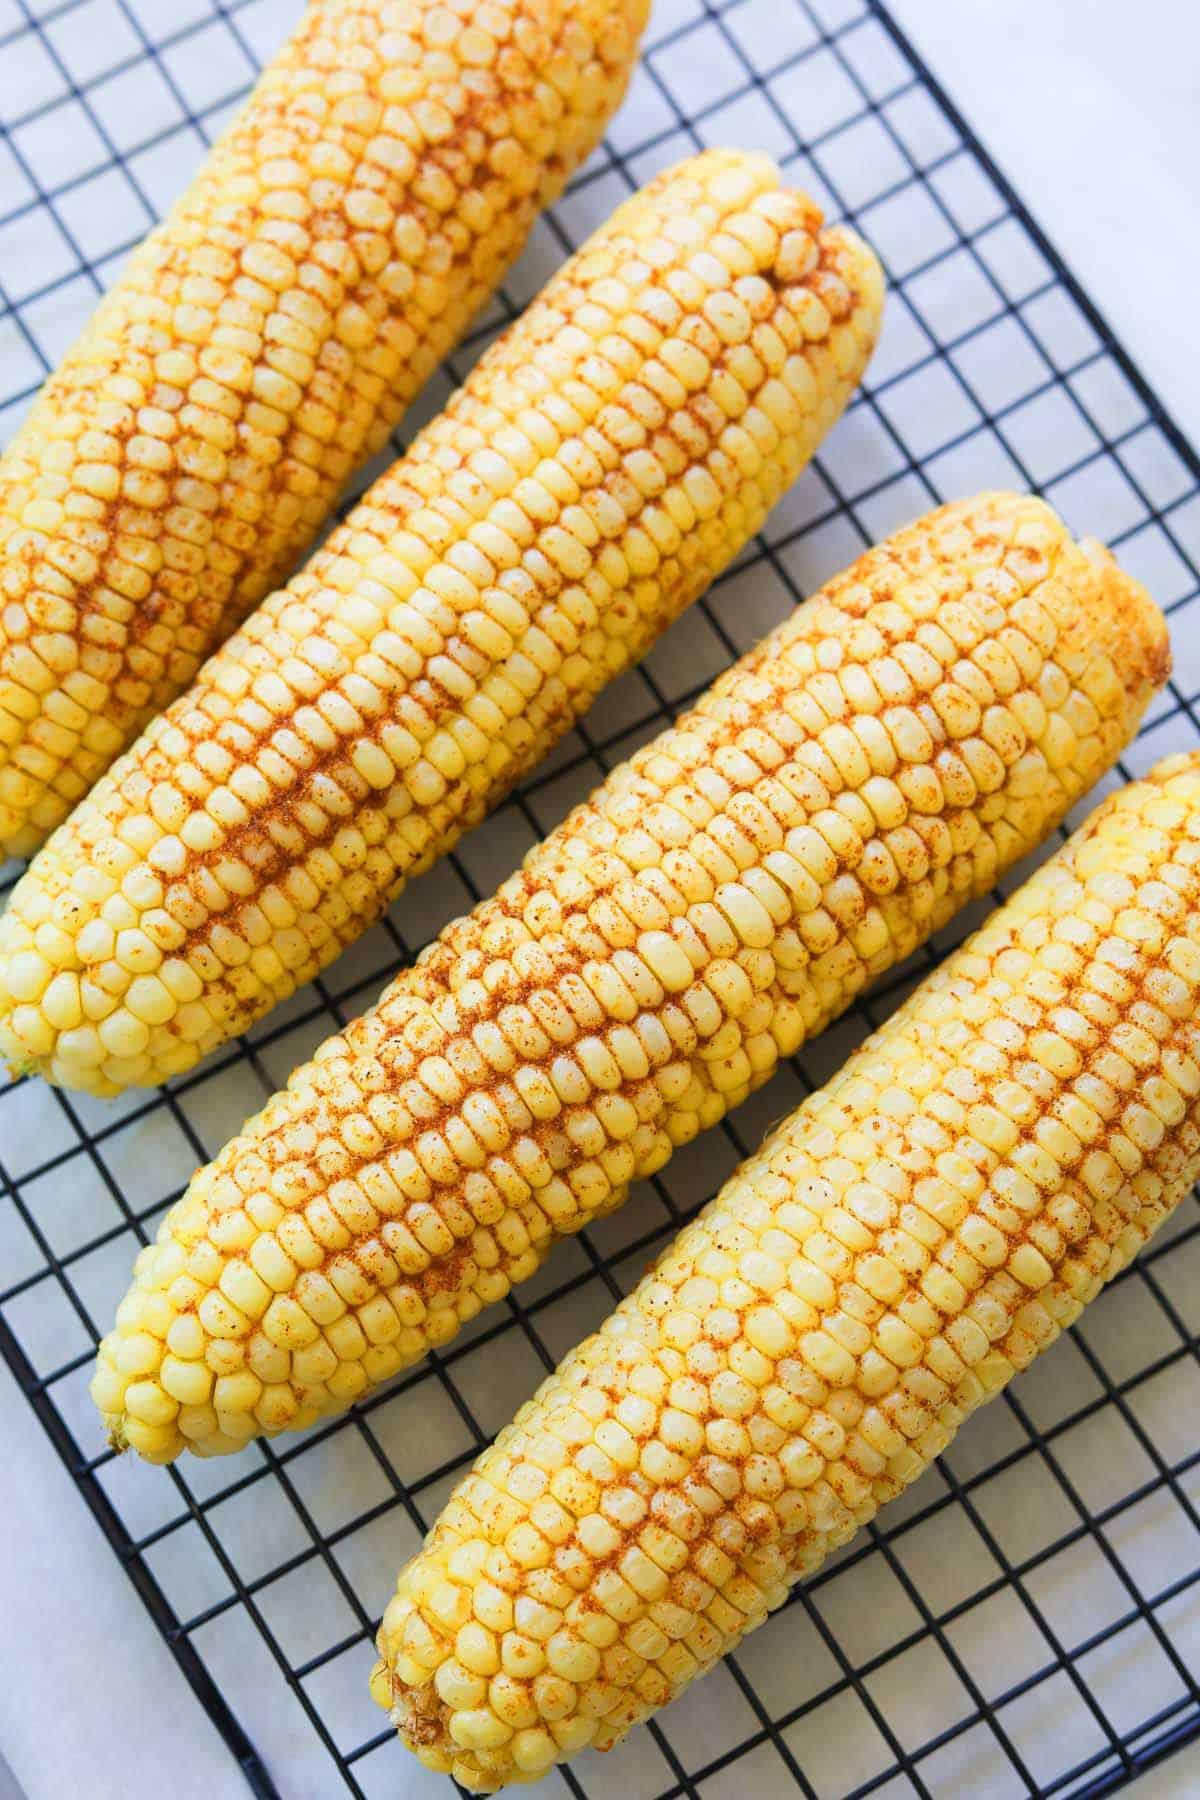 Four whole corn on a baking sheet.